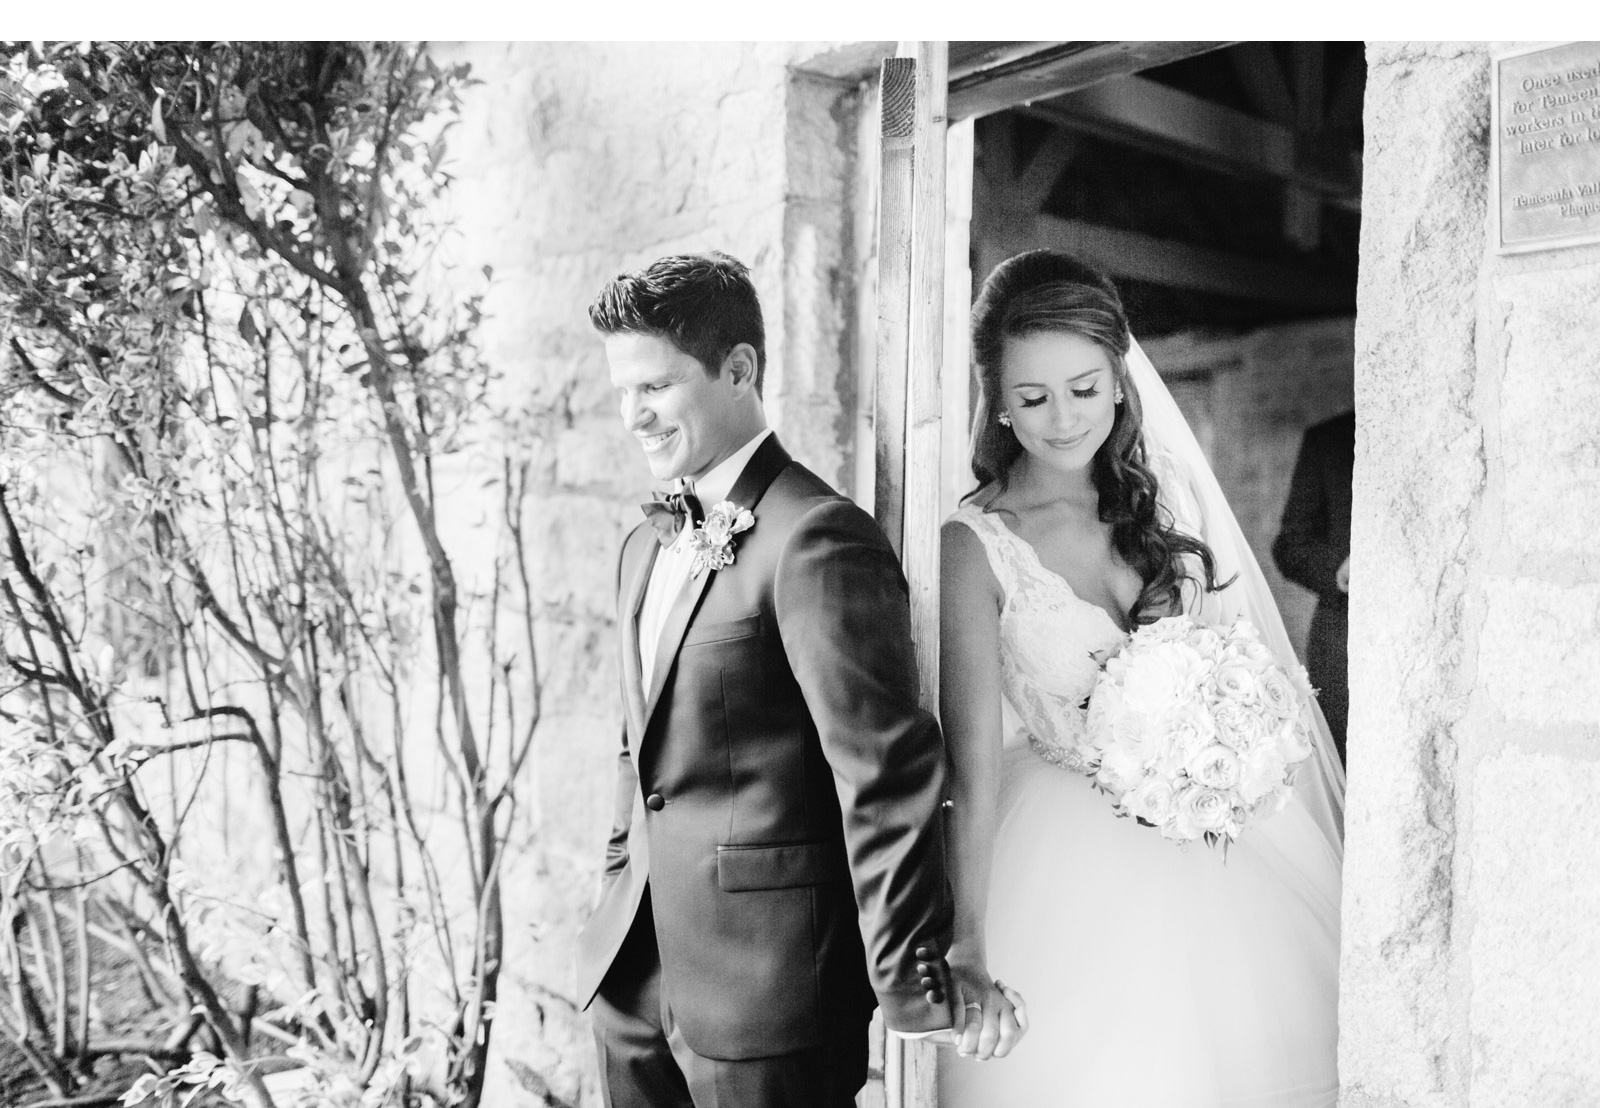 Nia-Sanchez-Wedding-Natalie-Schutt-Photography_04.jpg